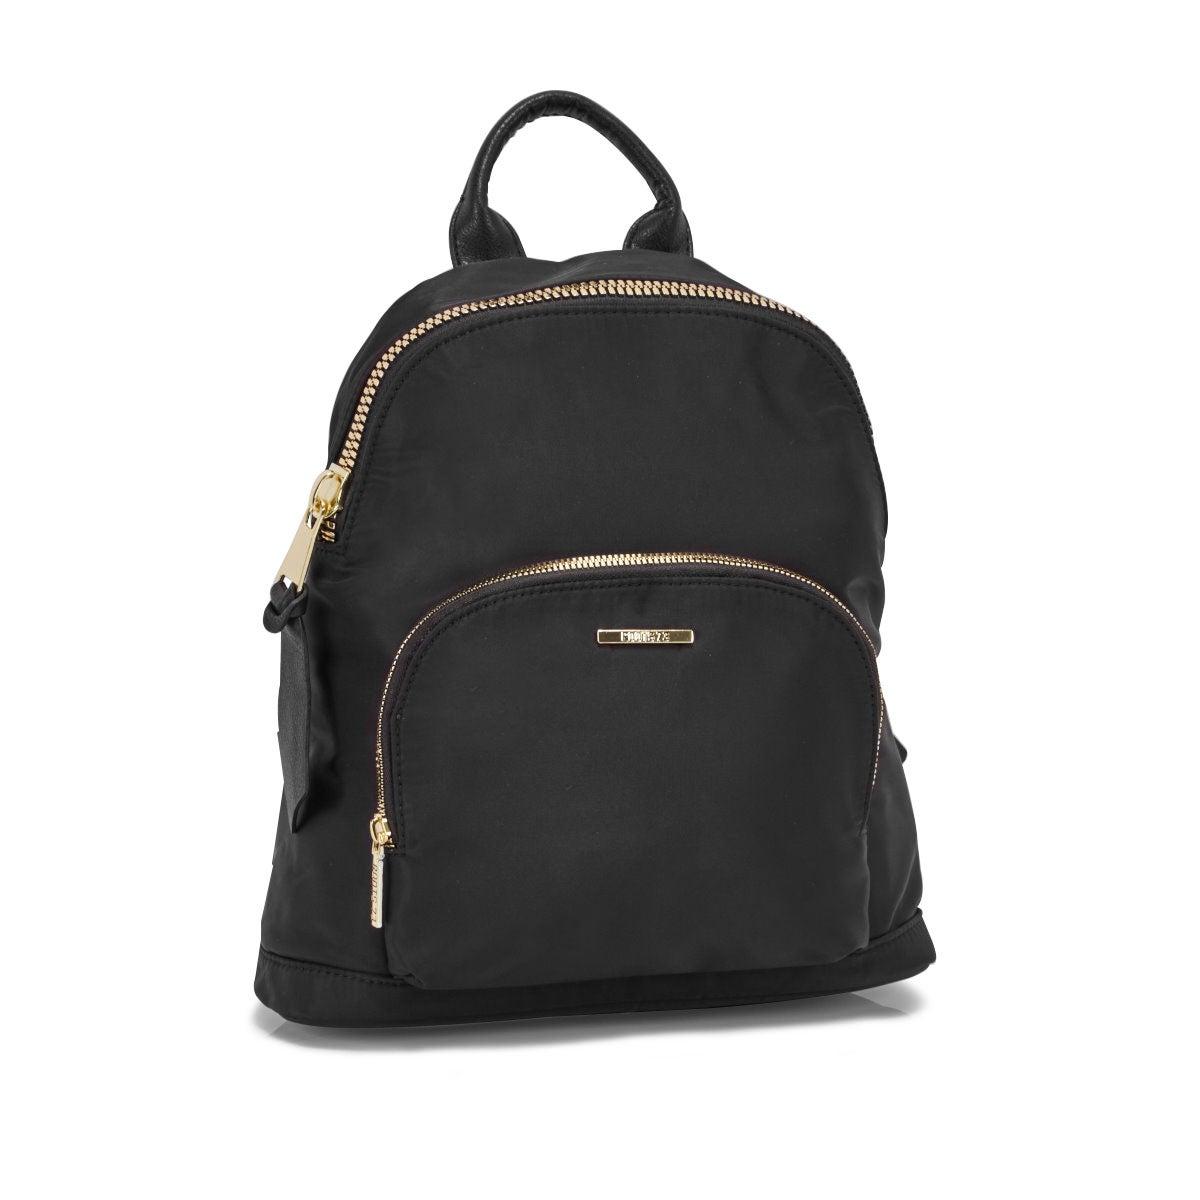 Lds Roots73 blk jumbo zipper backpack